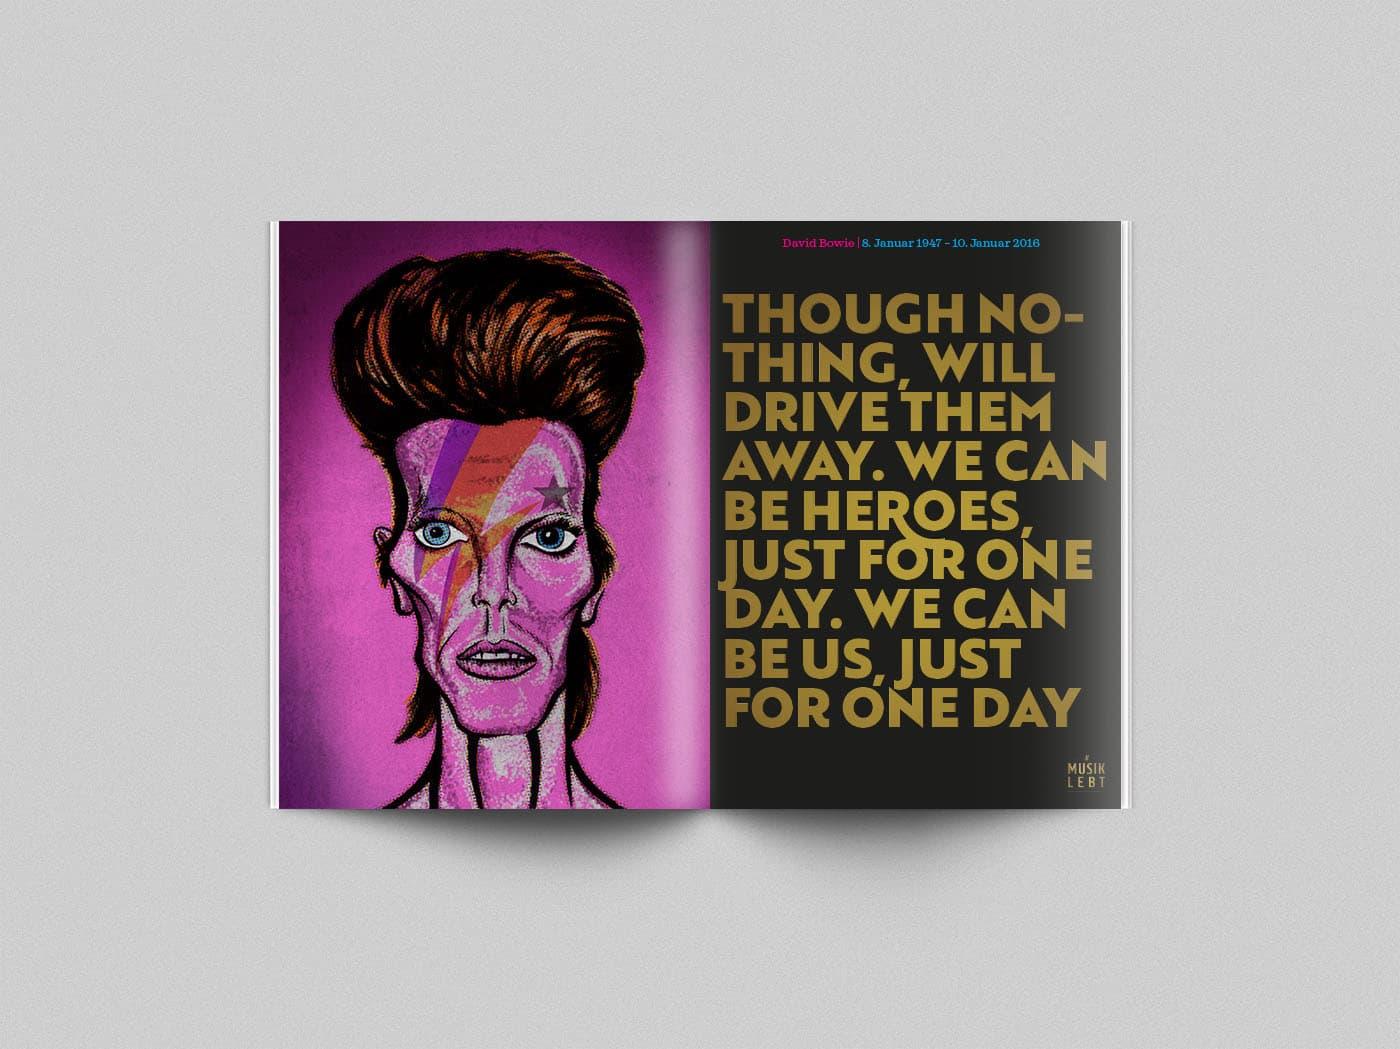 Musik lebt – David Bowie